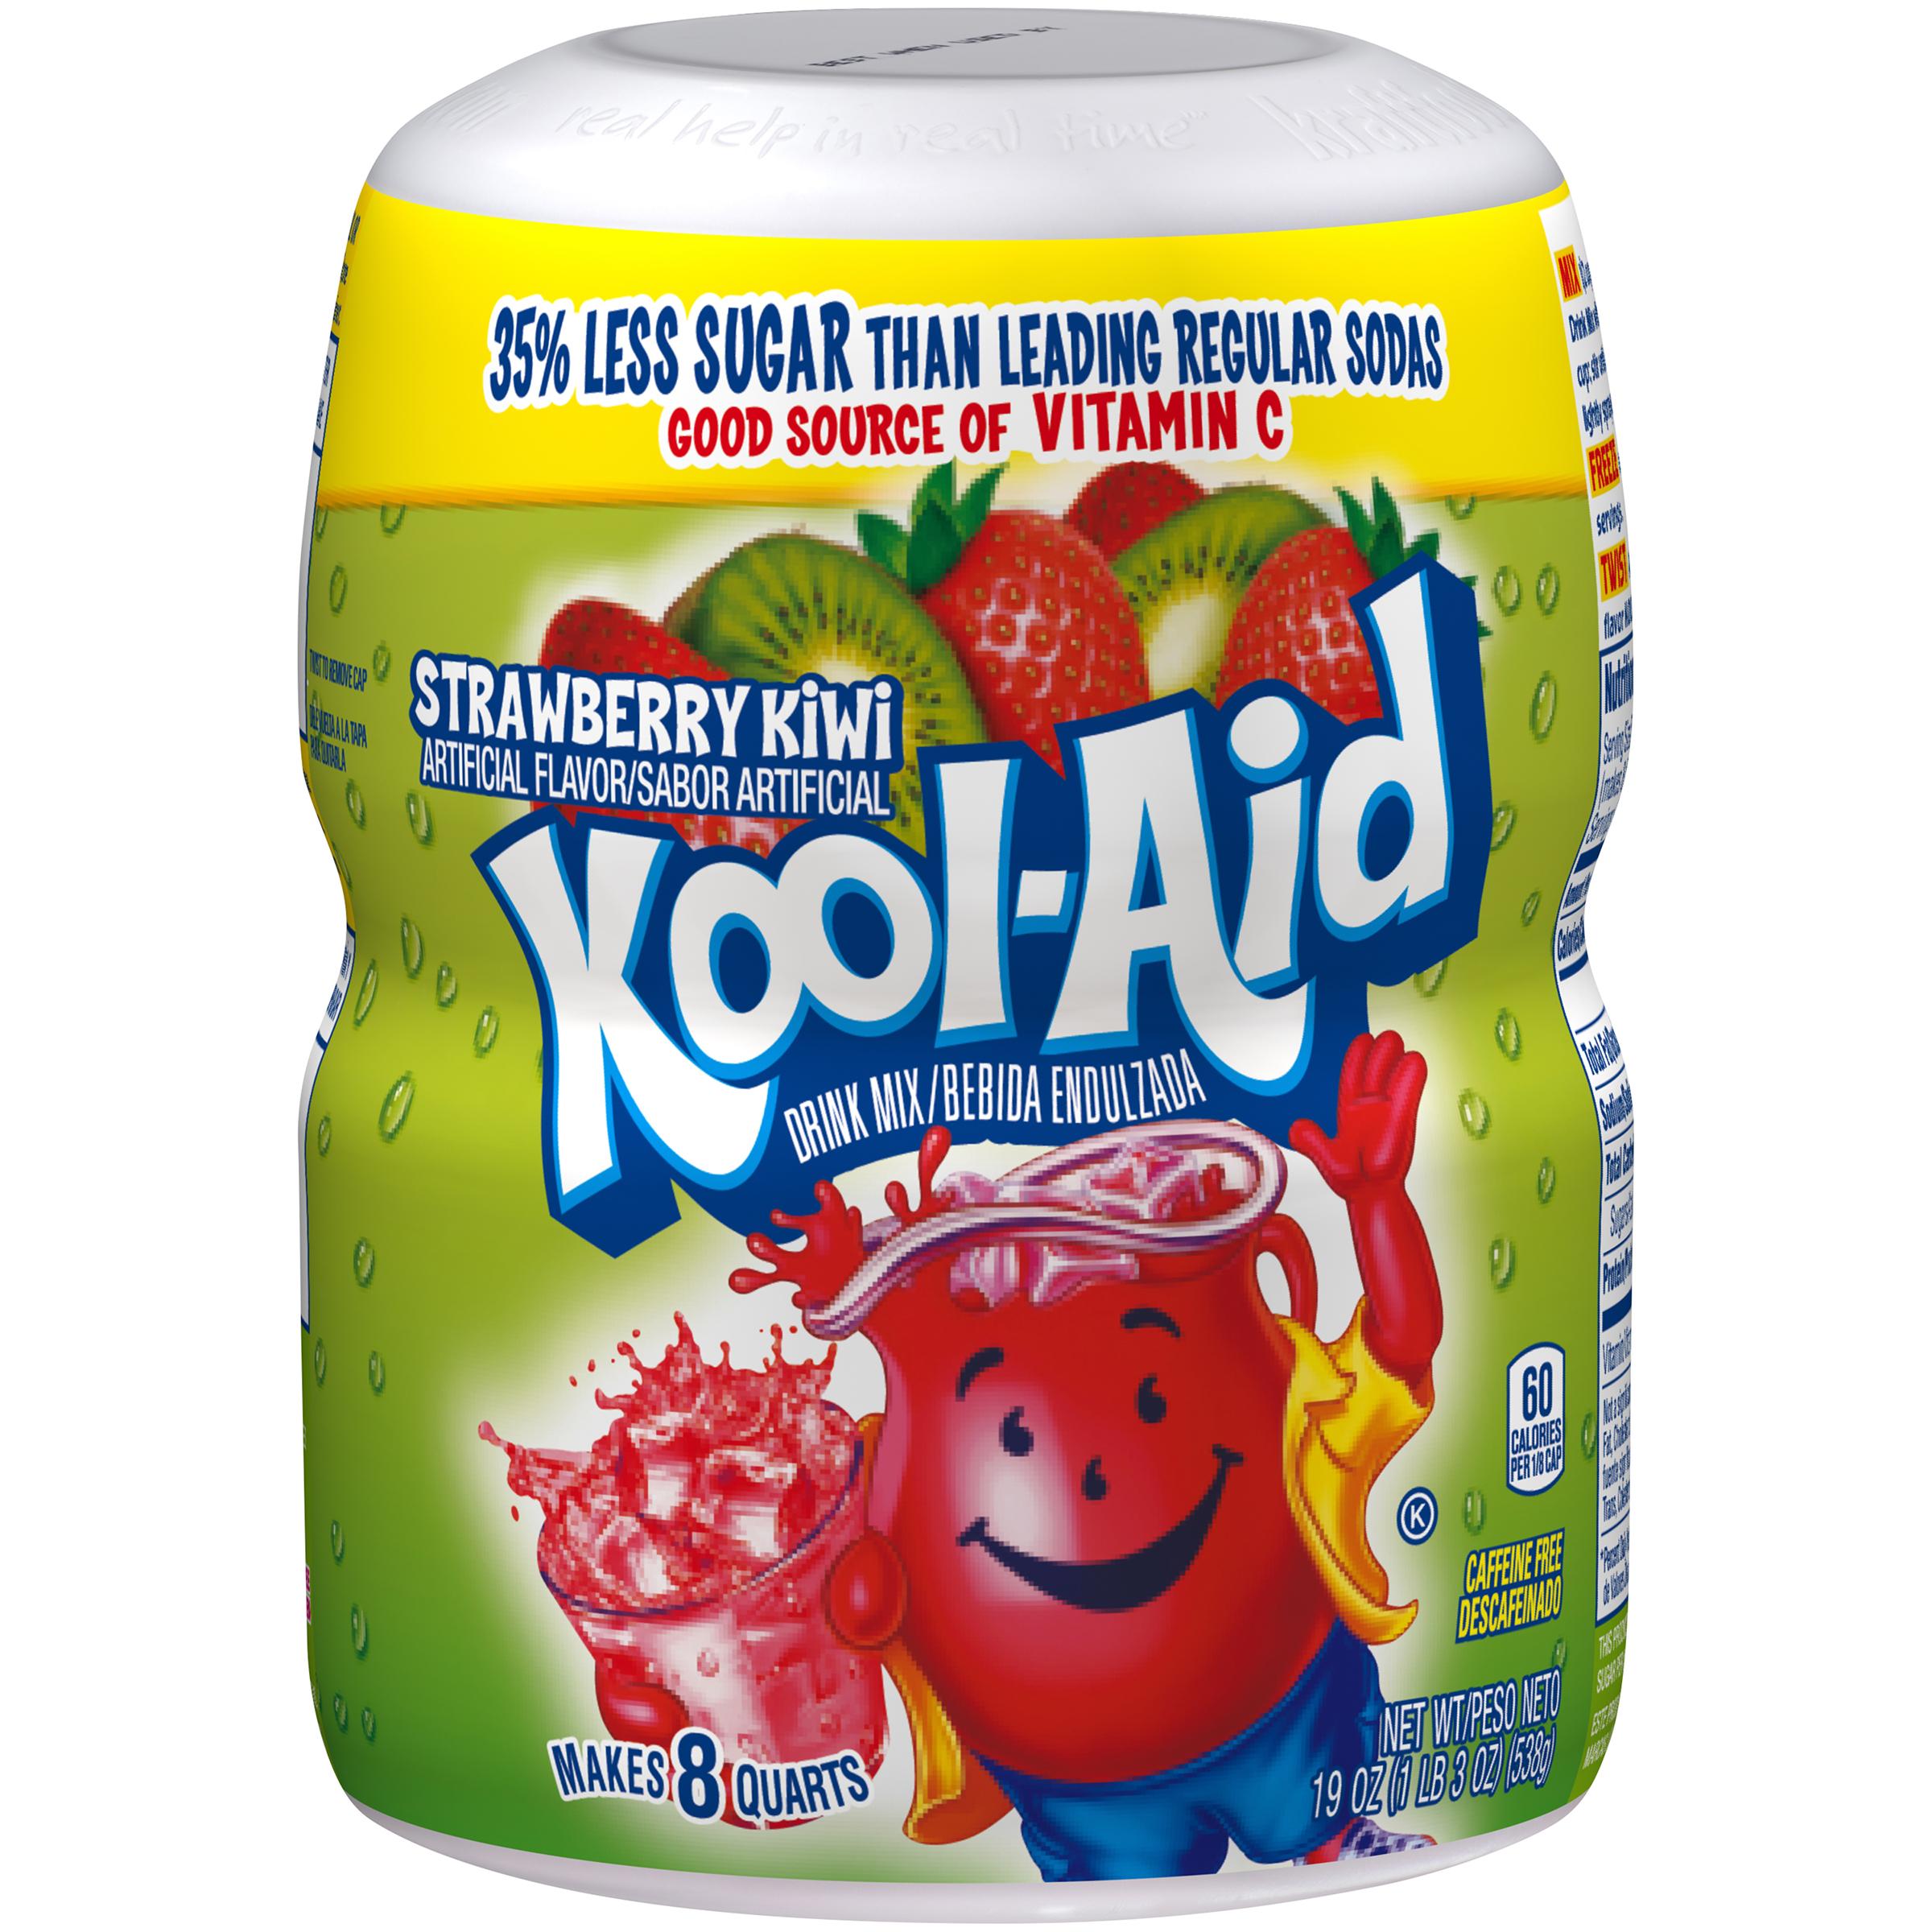 Kool-Aid Strawberry Kiwi Drink Mix 19 oz. Canister image